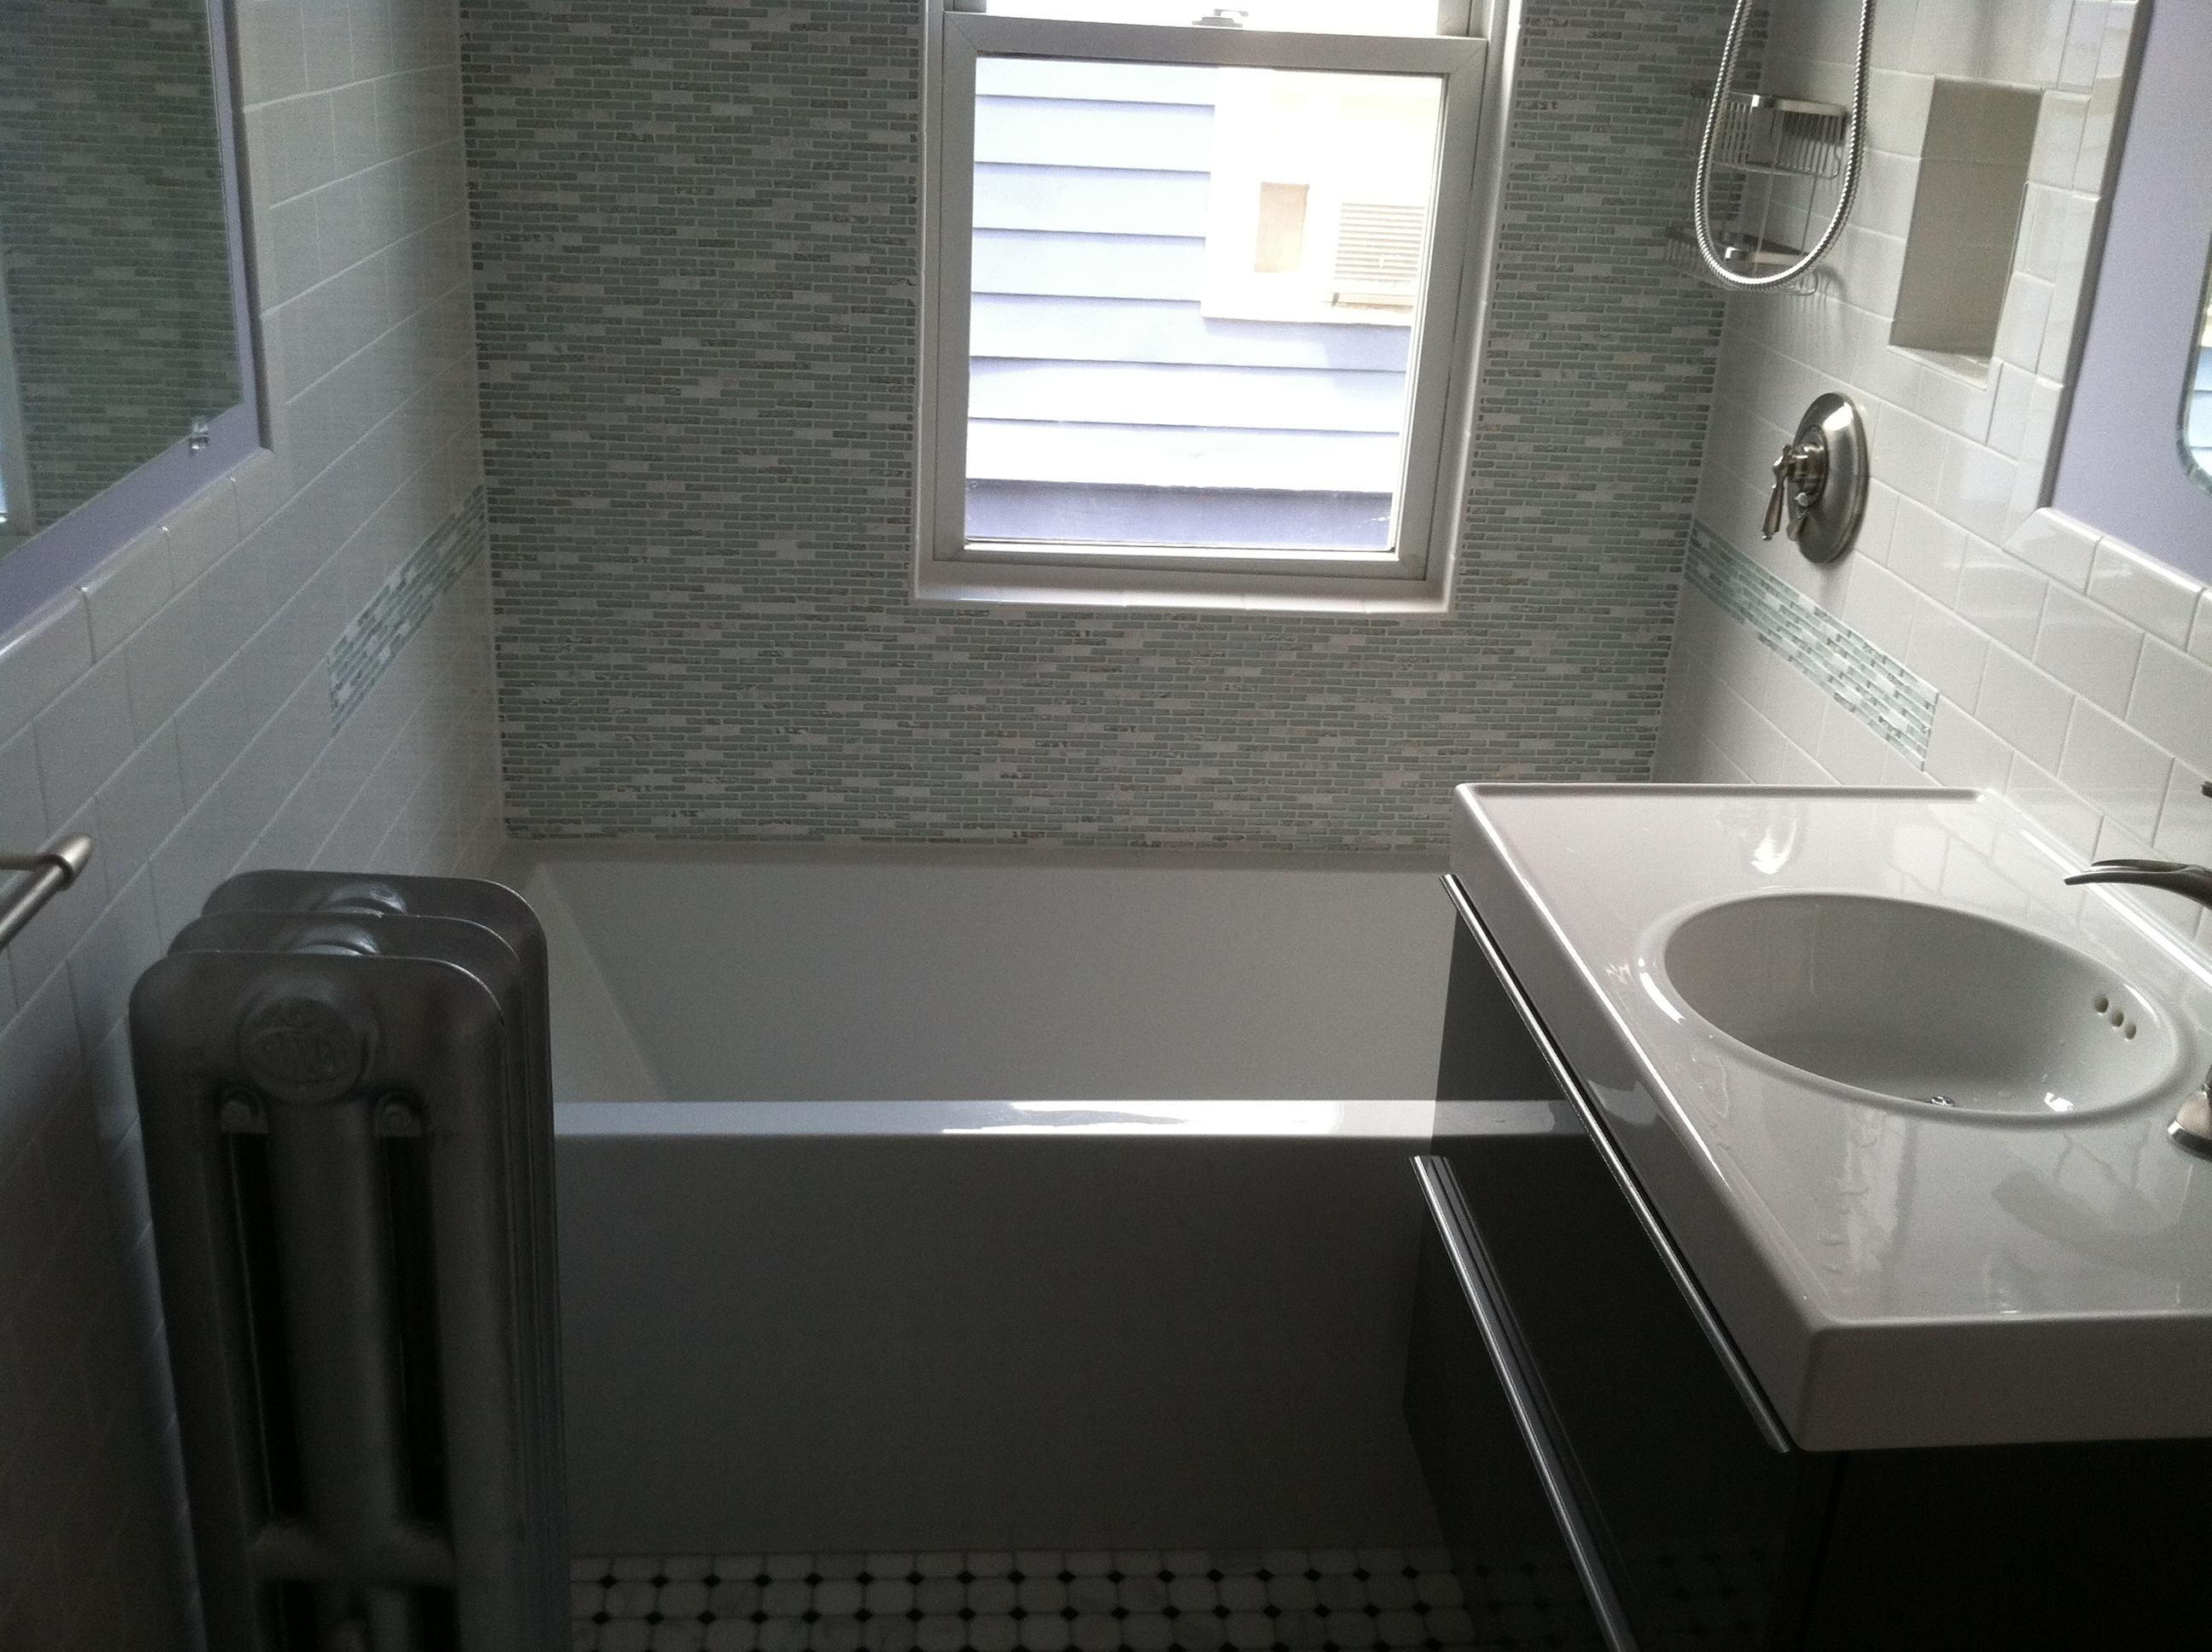 bathrooms demo rebuild jamaica plain henry scopa home improvements